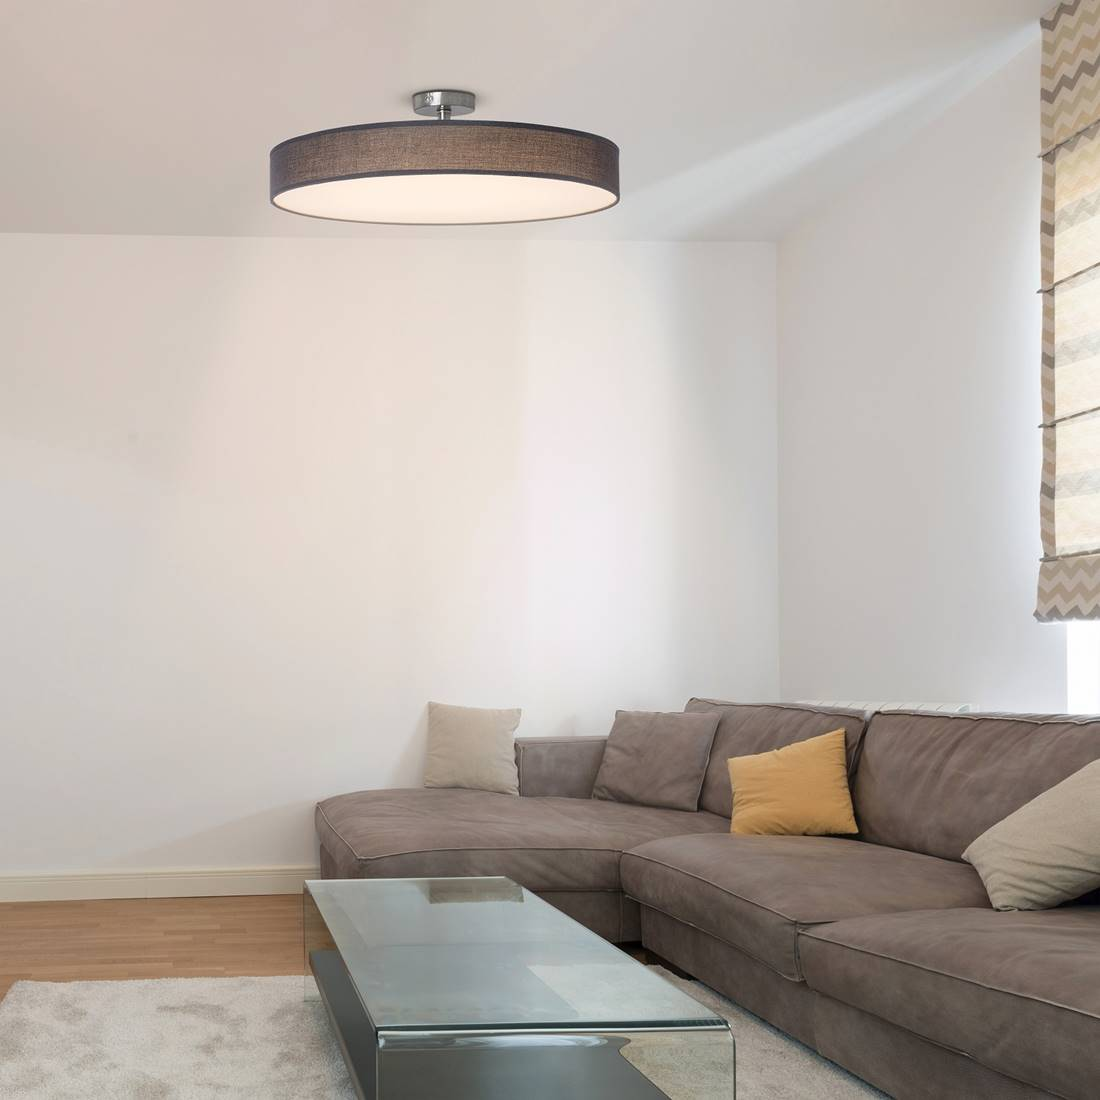 led deckenleuchte helios metall u stoff grau wei satin. Black Bedroom Furniture Sets. Home Design Ideas